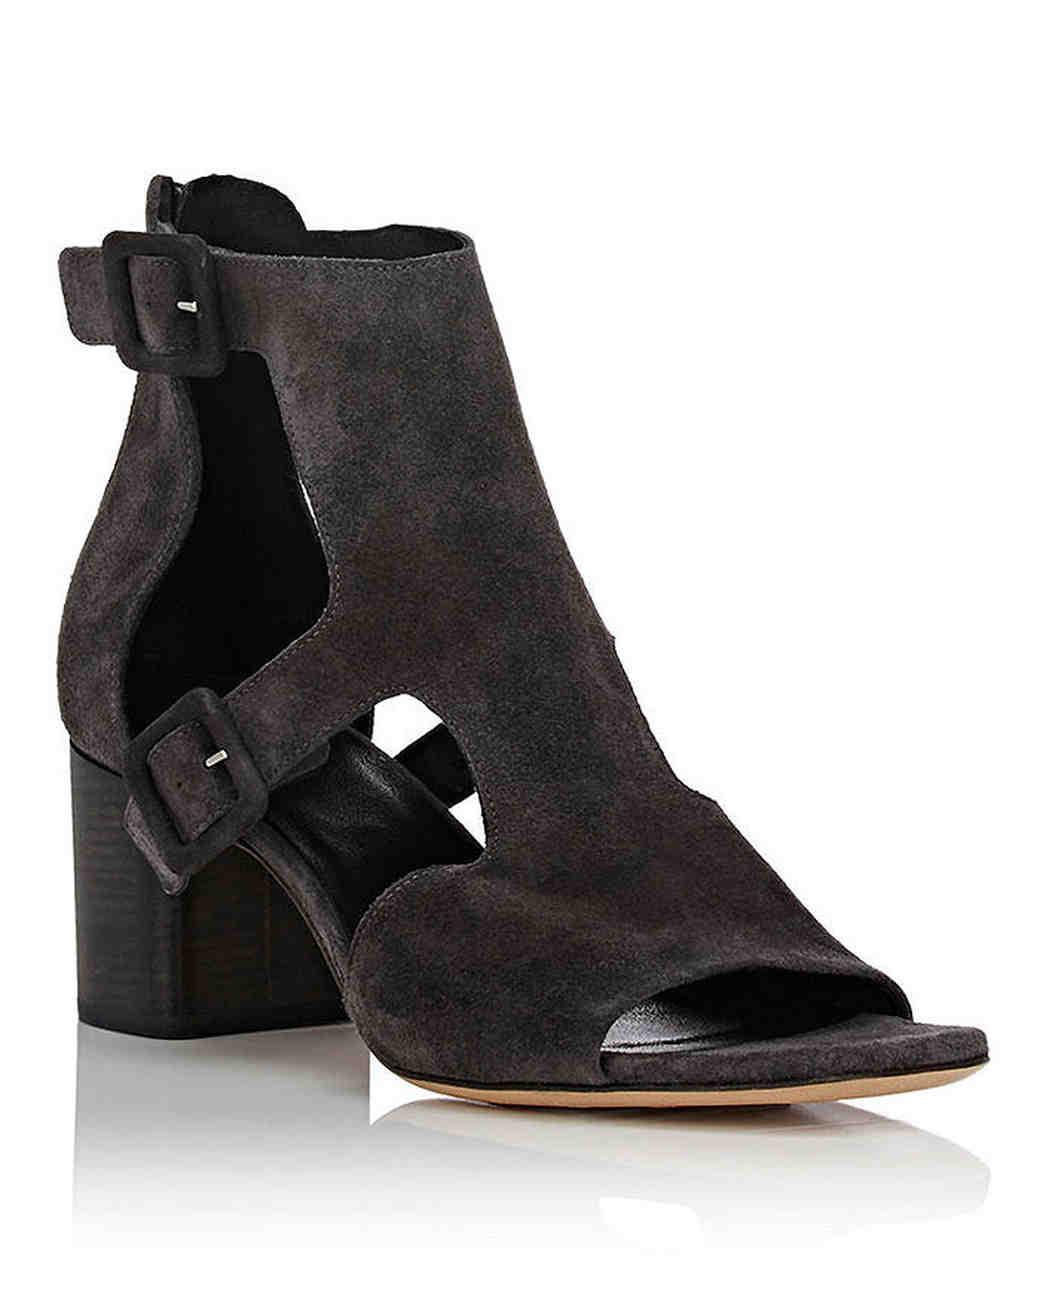 Rag & Bone Matteo double-buckle sandals